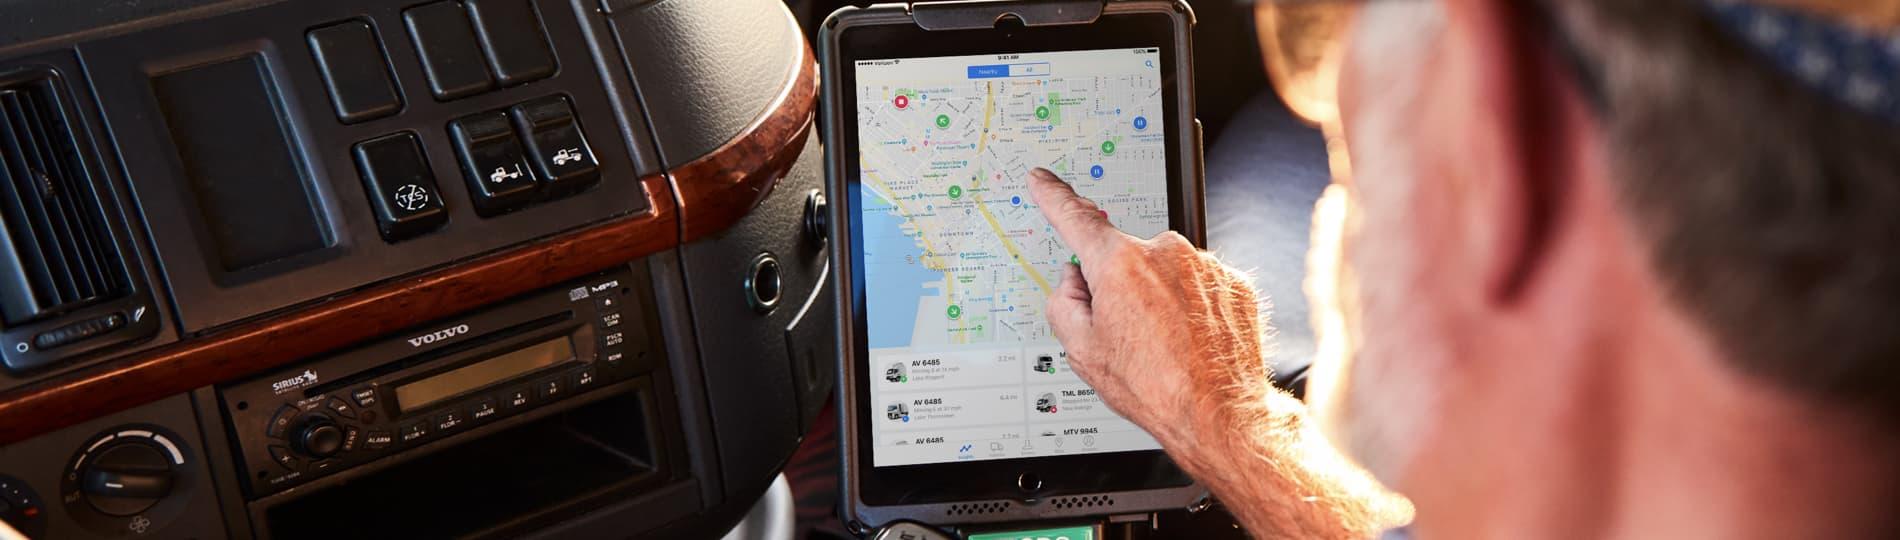 Advanced GPS fleet tracking software